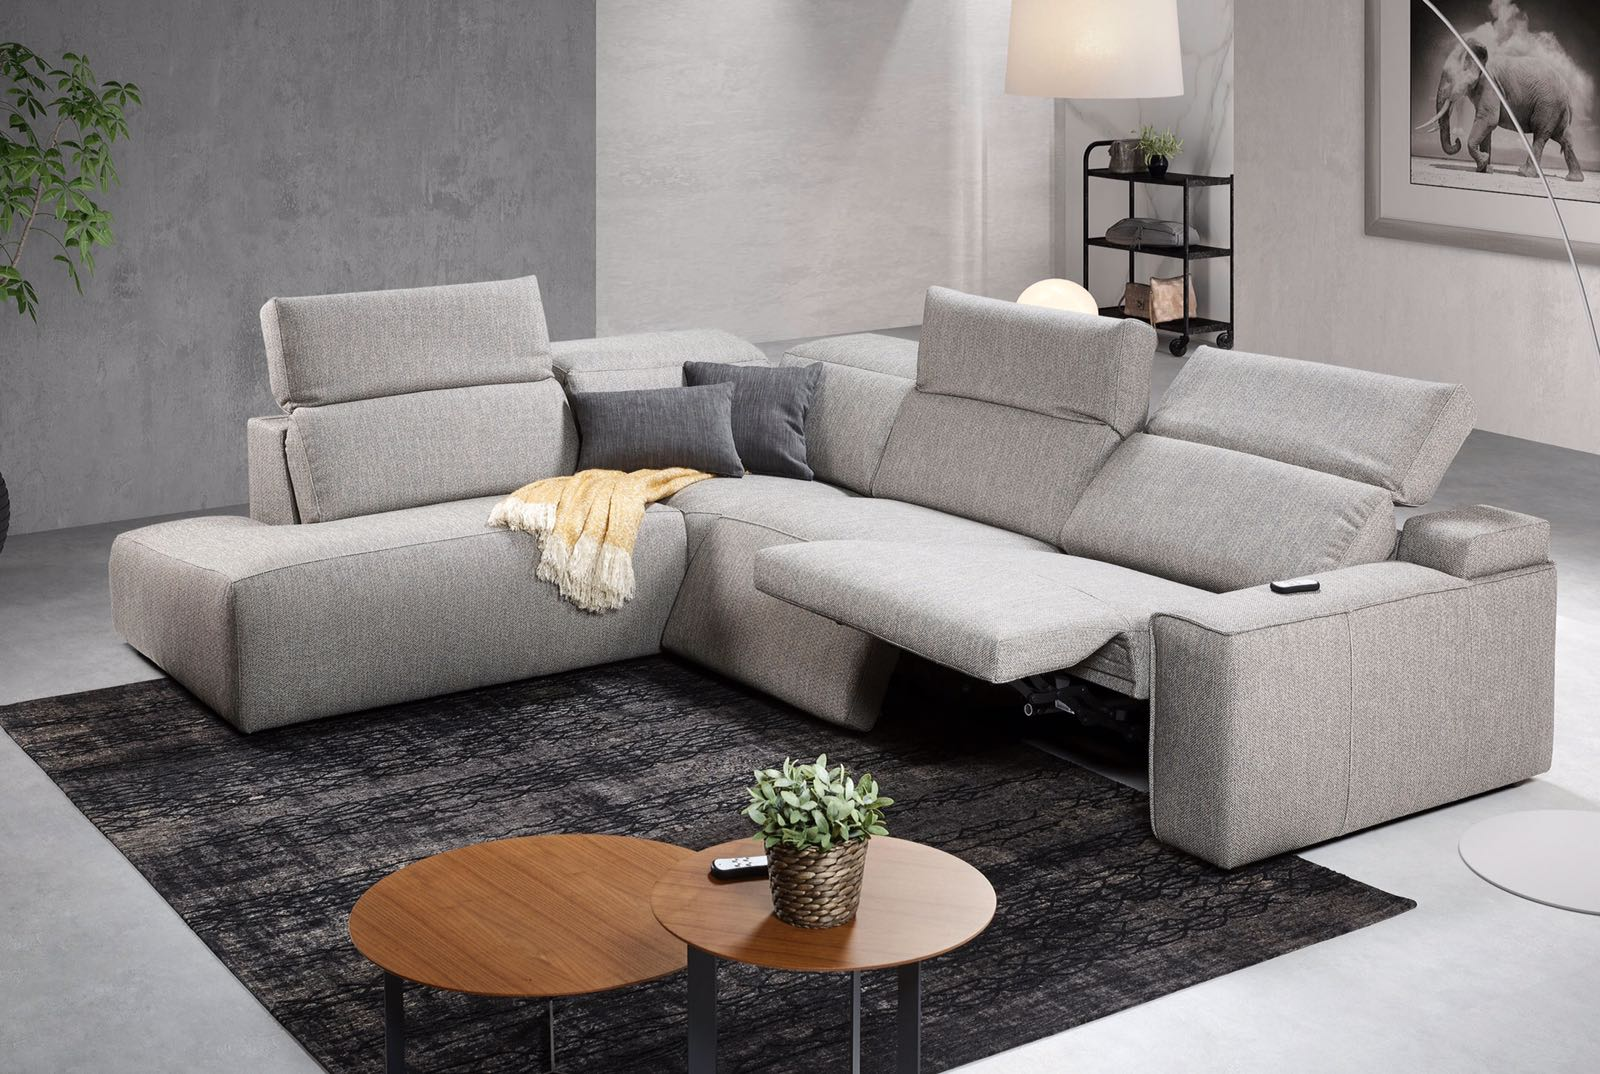 Sofa espacio motor